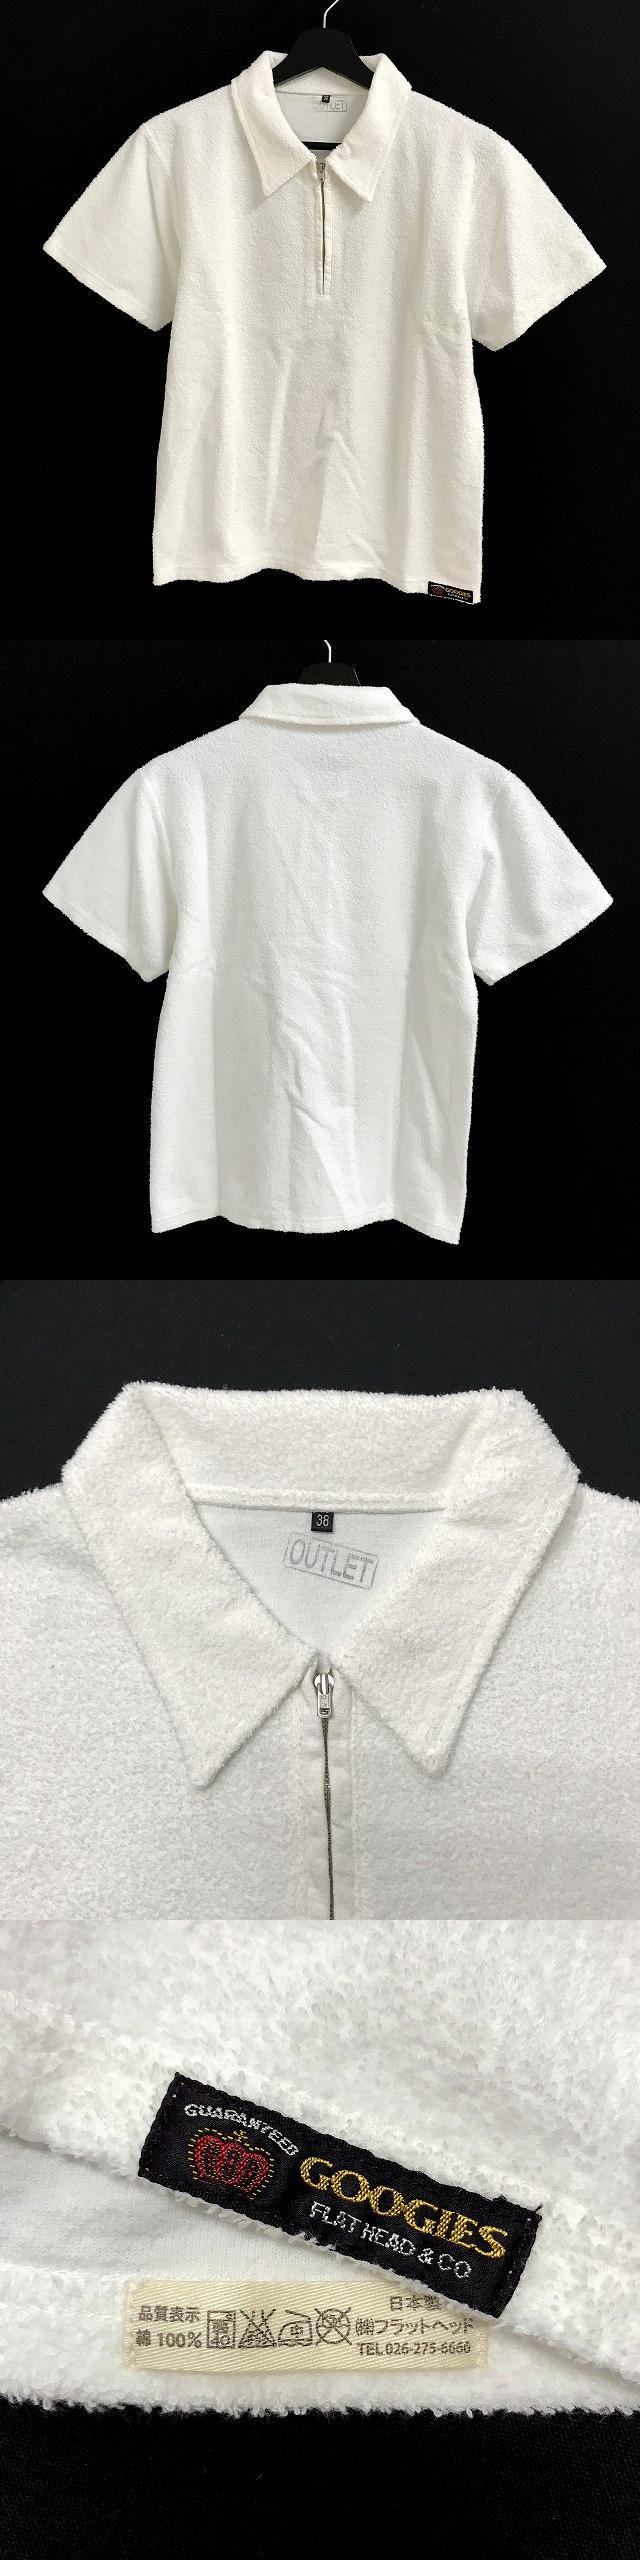 GOOGIES ハーフジップ プルオーバー パイル カットソー ポロシャツ 半袖 ホワイト 白 38